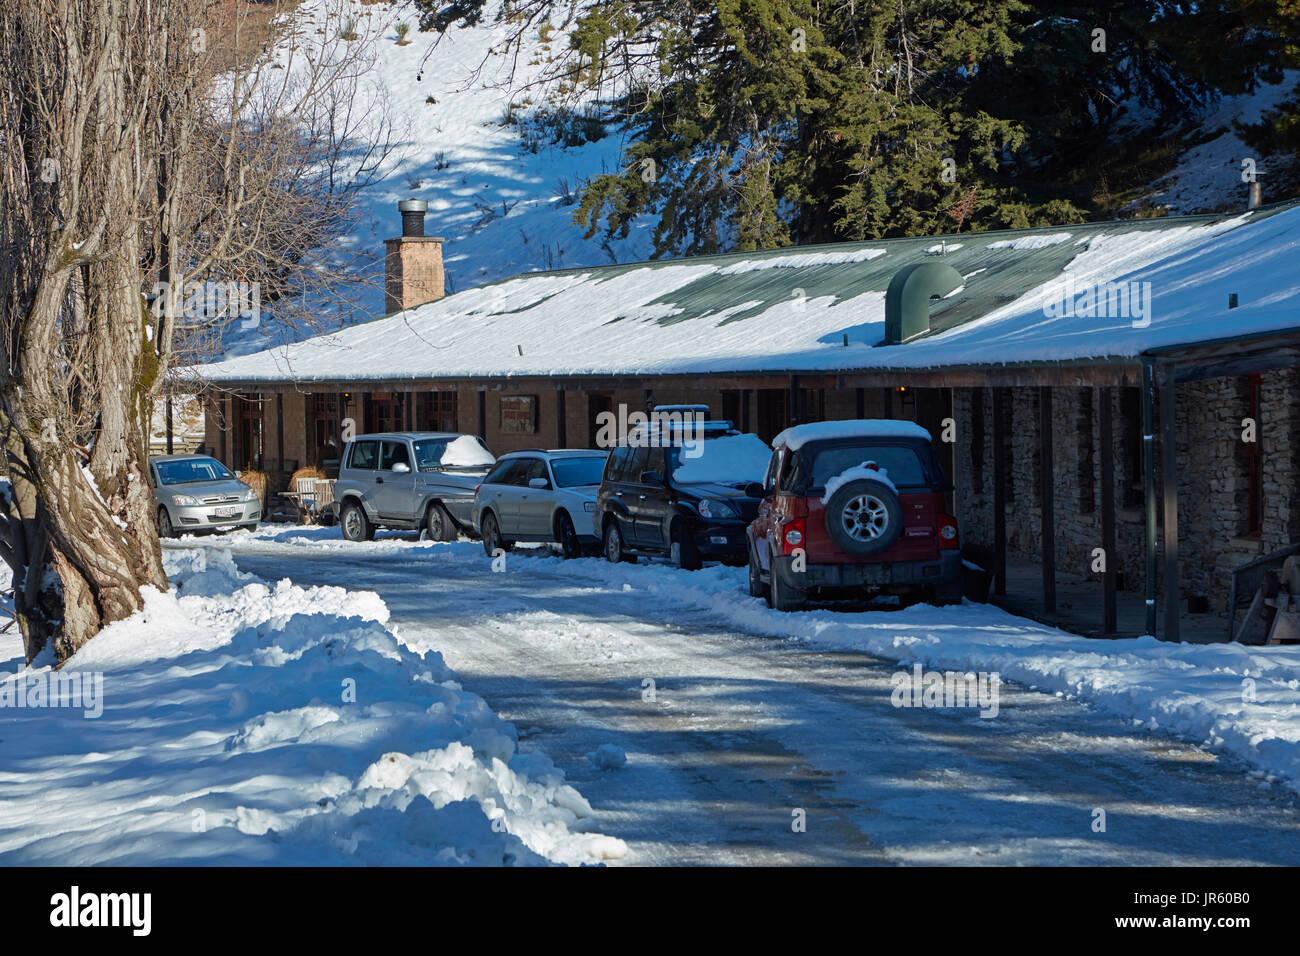 Danseys Pass Coach Inn (1862) and winter snow, Danseys Pass, Central Otago, South Island, New Zealand - Stock Image